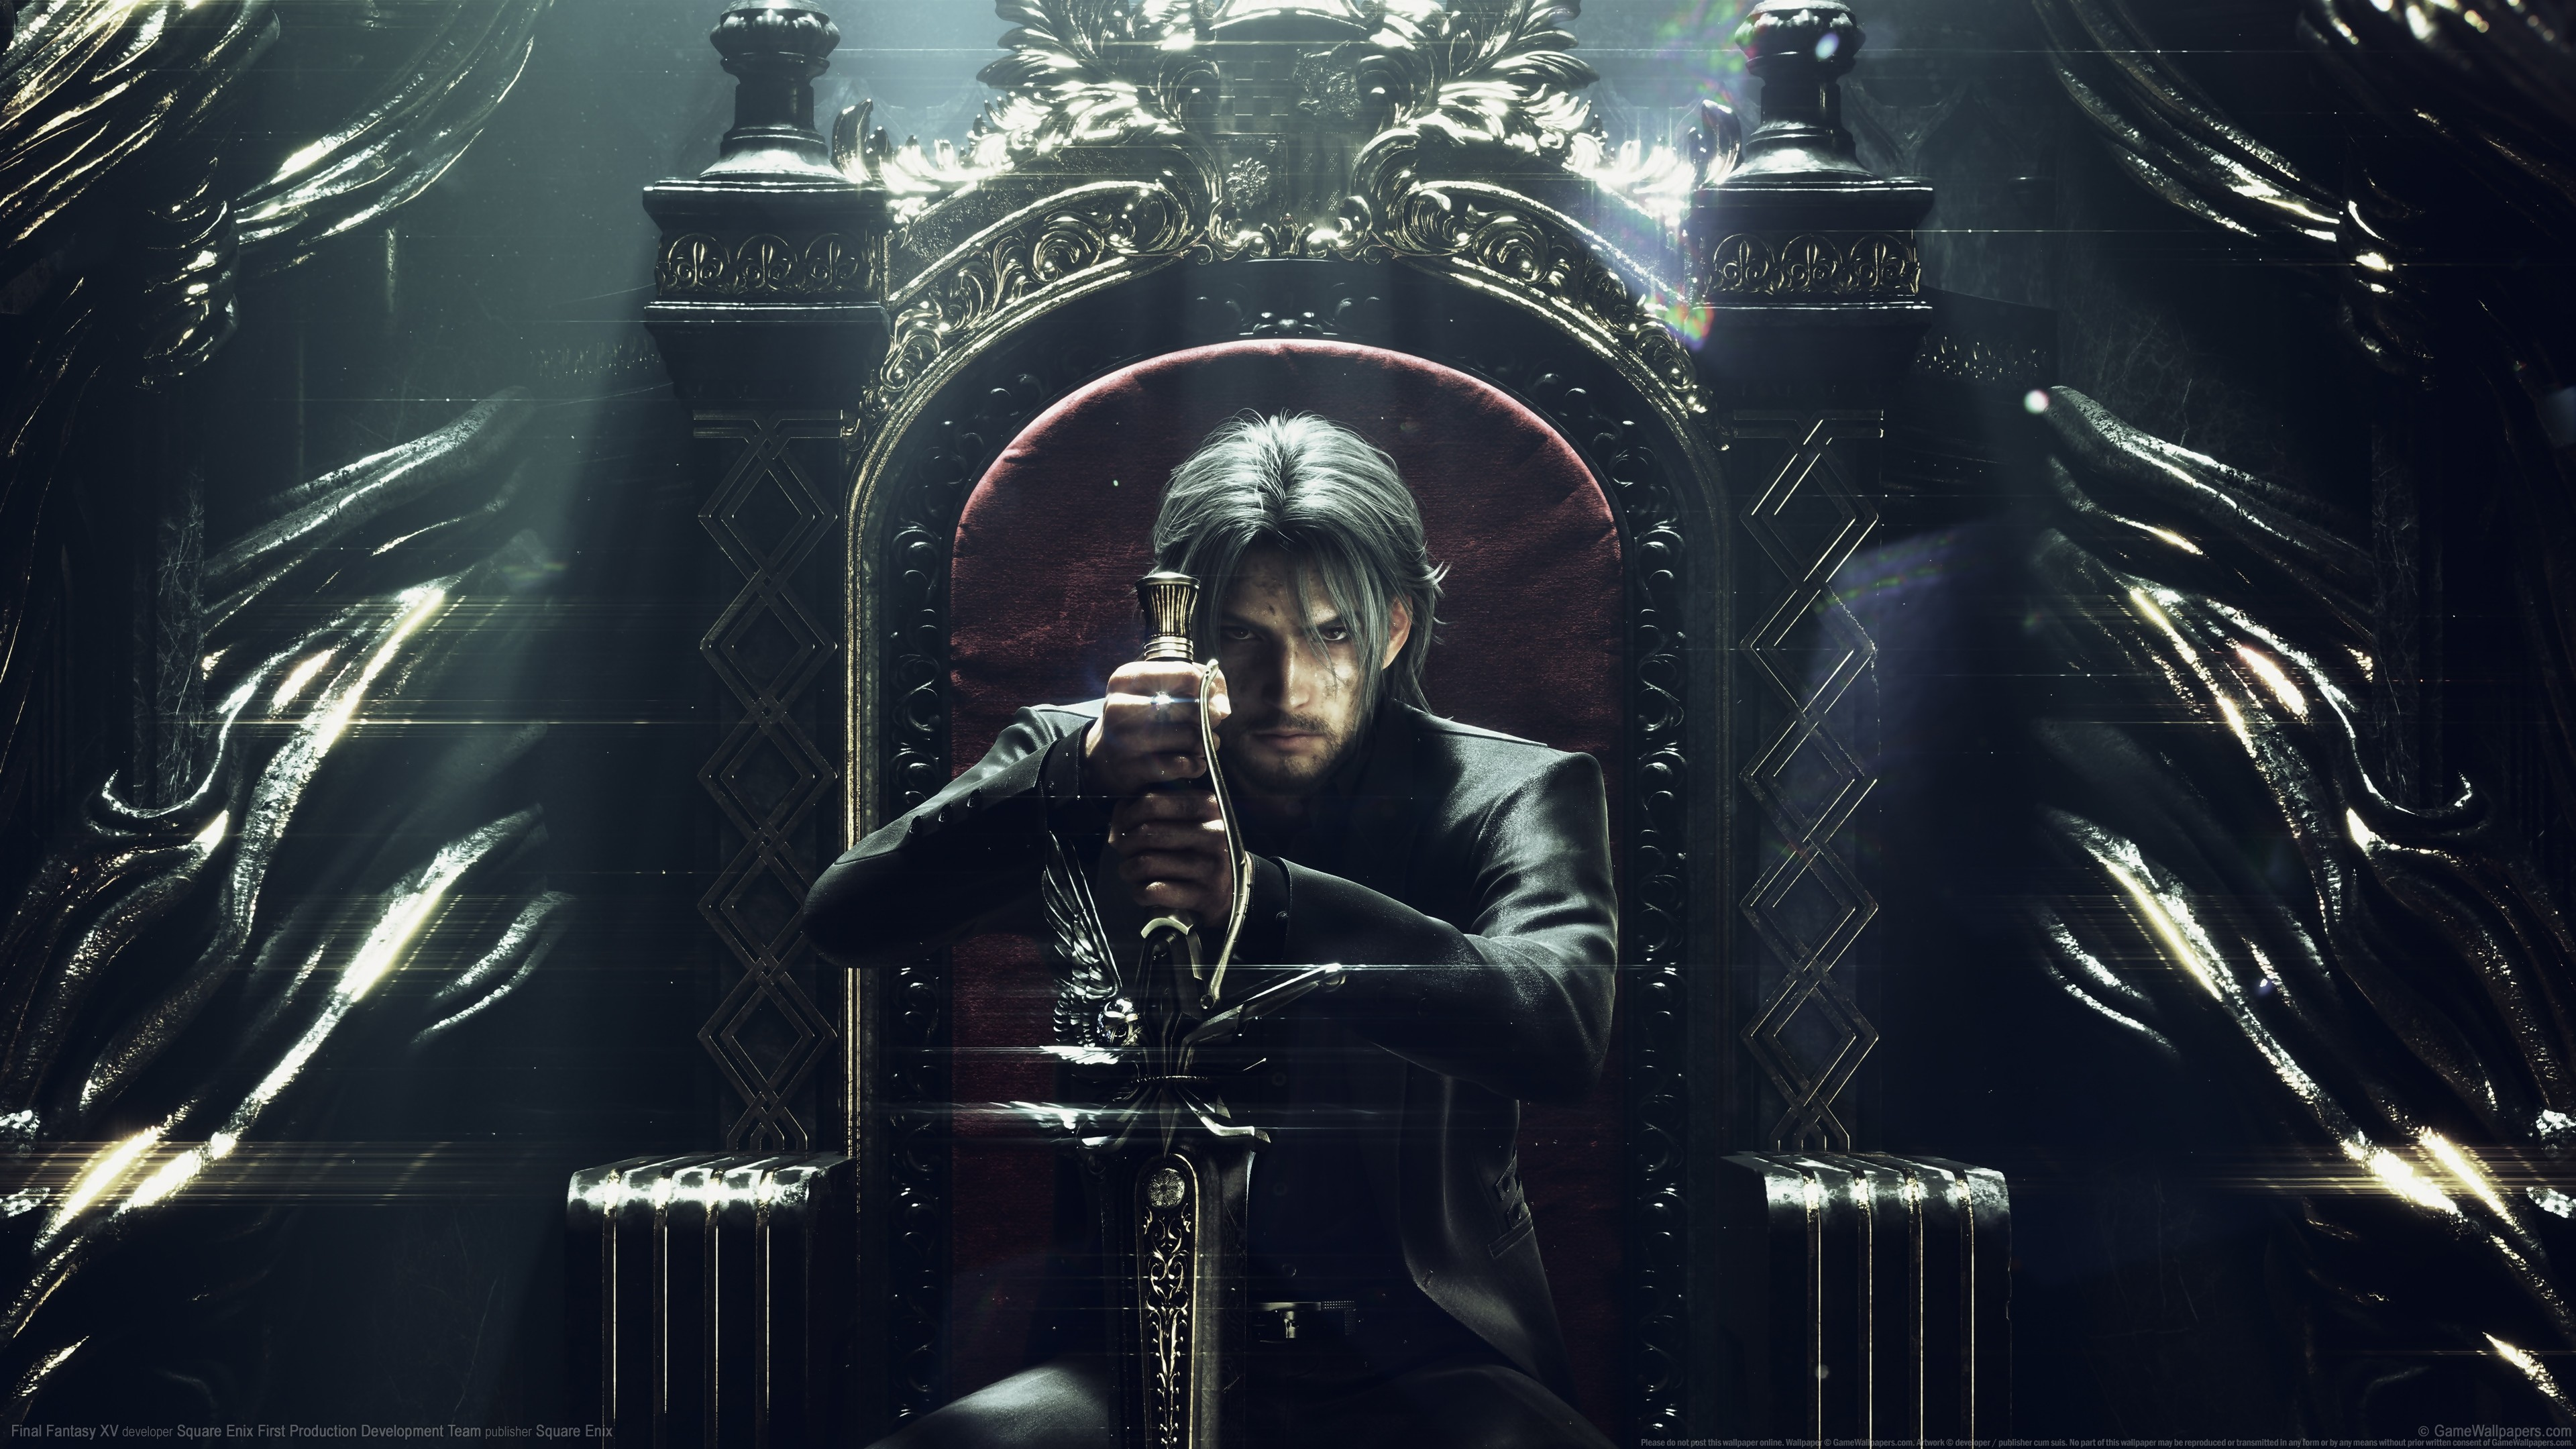 4k Noctis Lucis Caelum Final Fantasy Xv Hd Games 4k: Artworks Final Fantasy XV